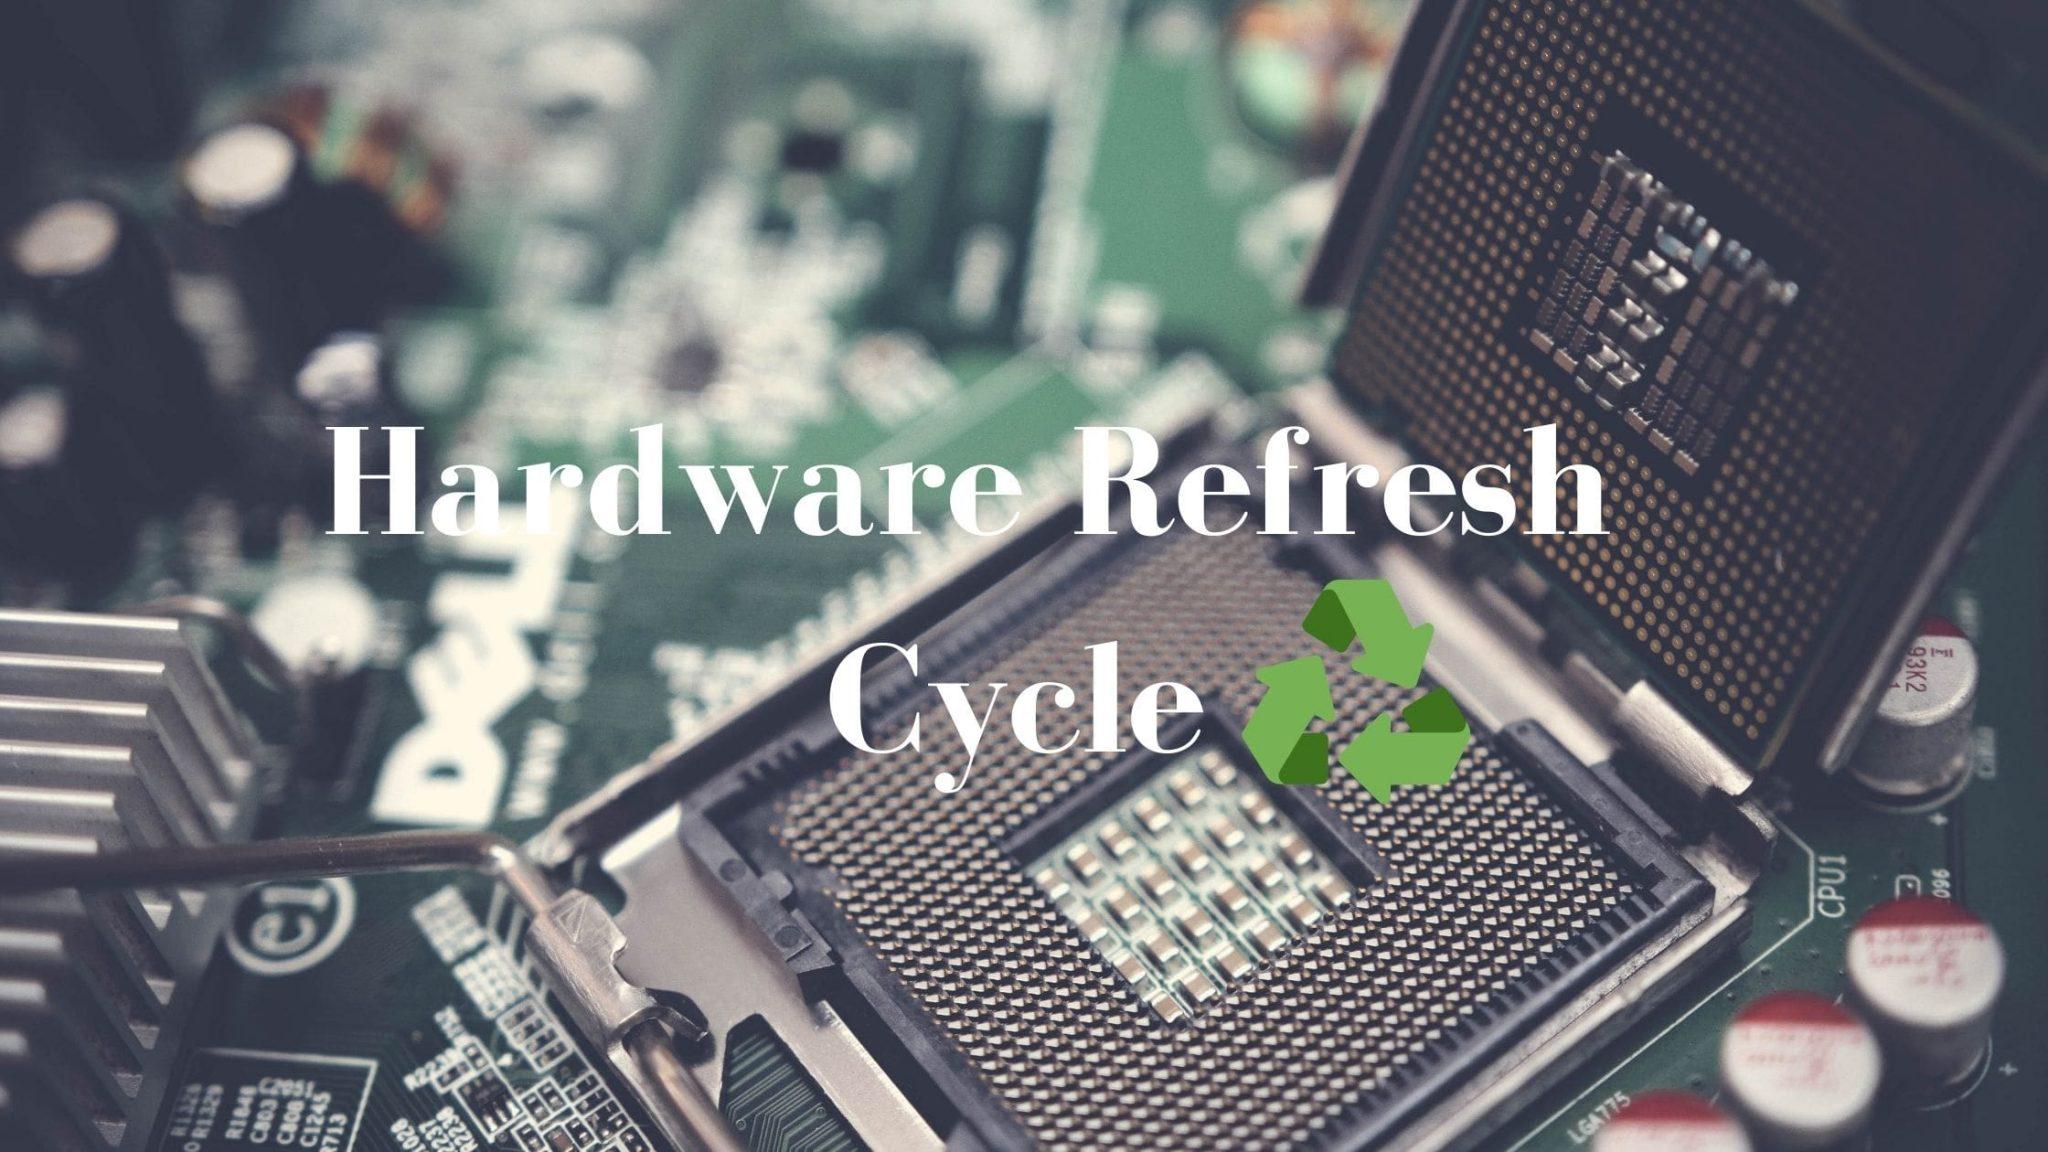 Hardware Refresh Cycle